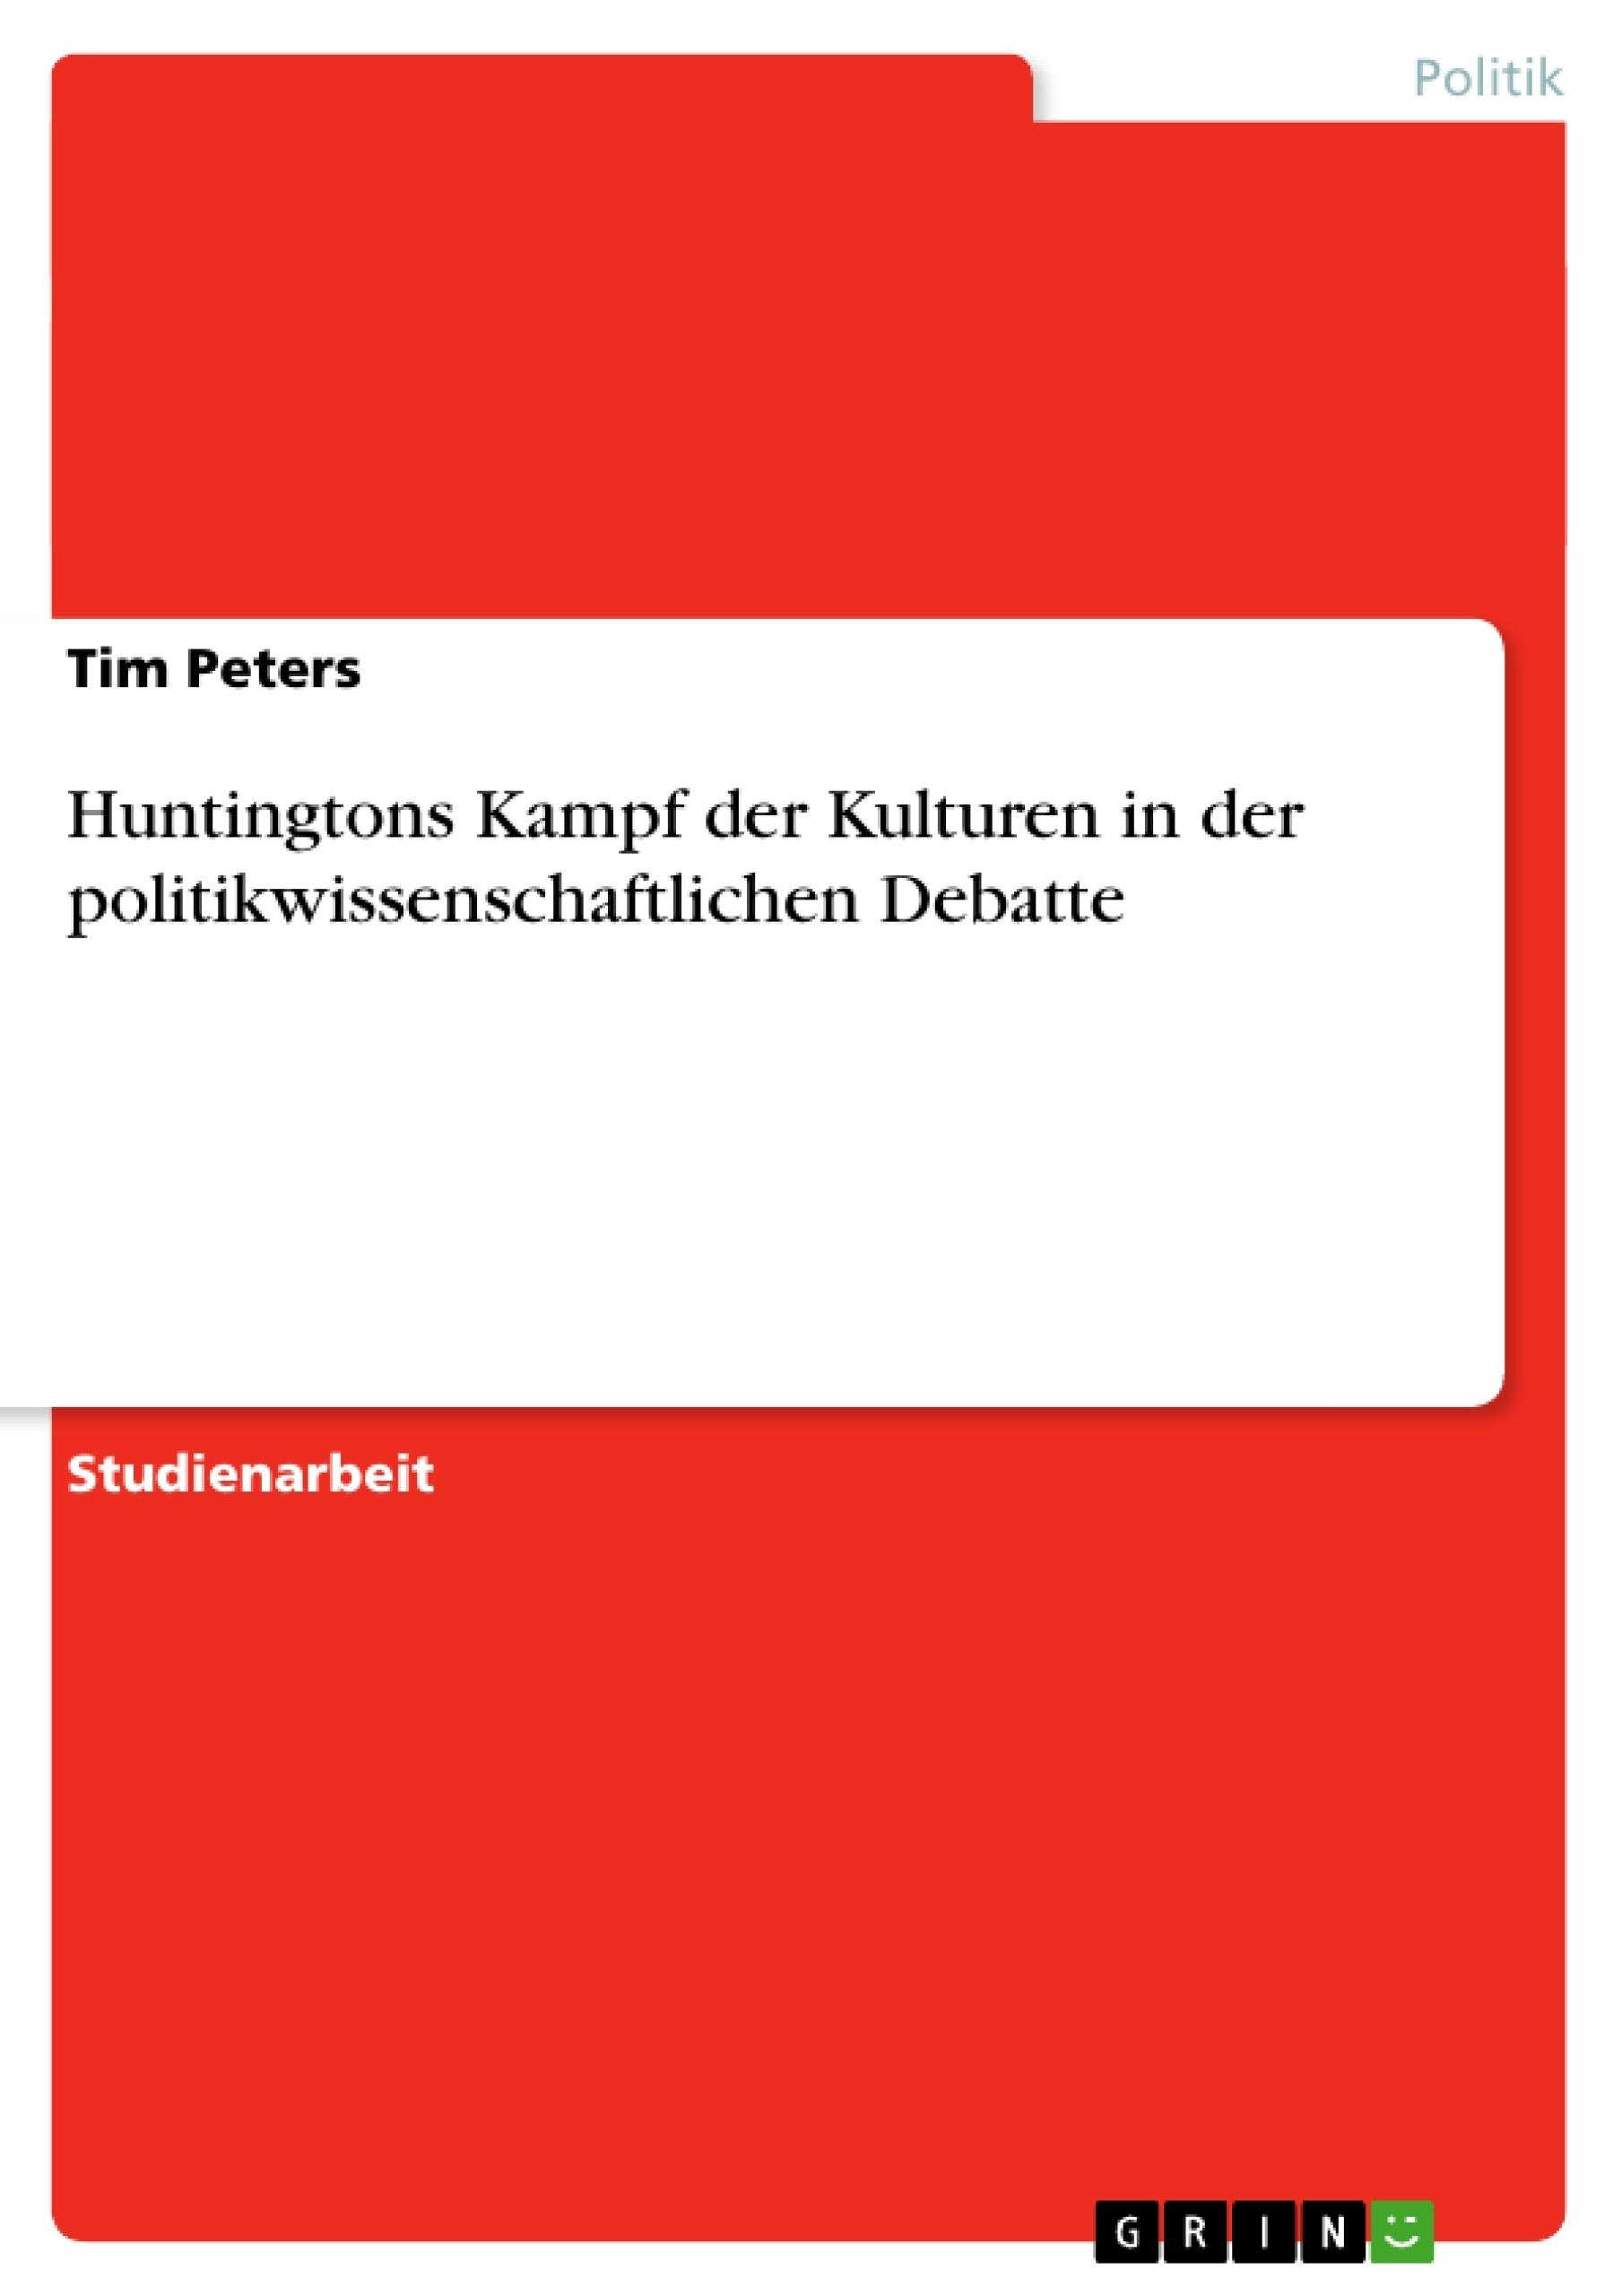 Titel: Huntingtons Kampf der Kulturen in der politikwissenschaftlichen Debatte